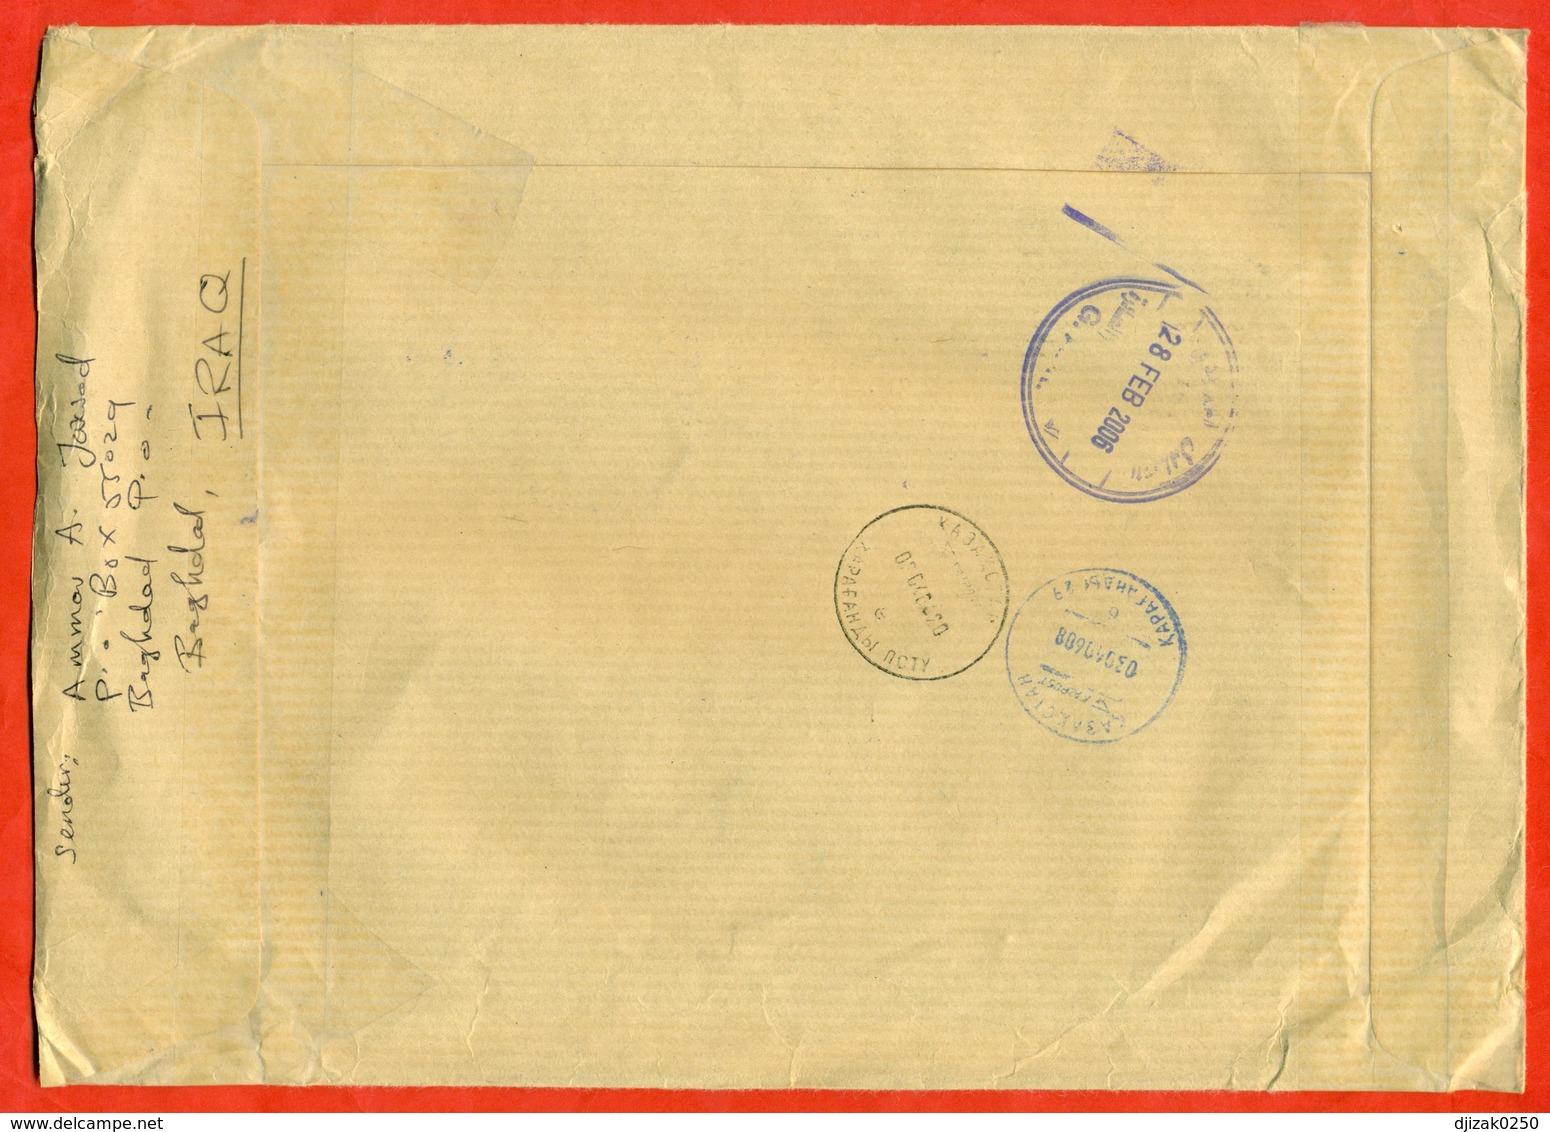 Iraq 2004. Registered Envelope Passed The Mail. Ancient Transportation. - Transport